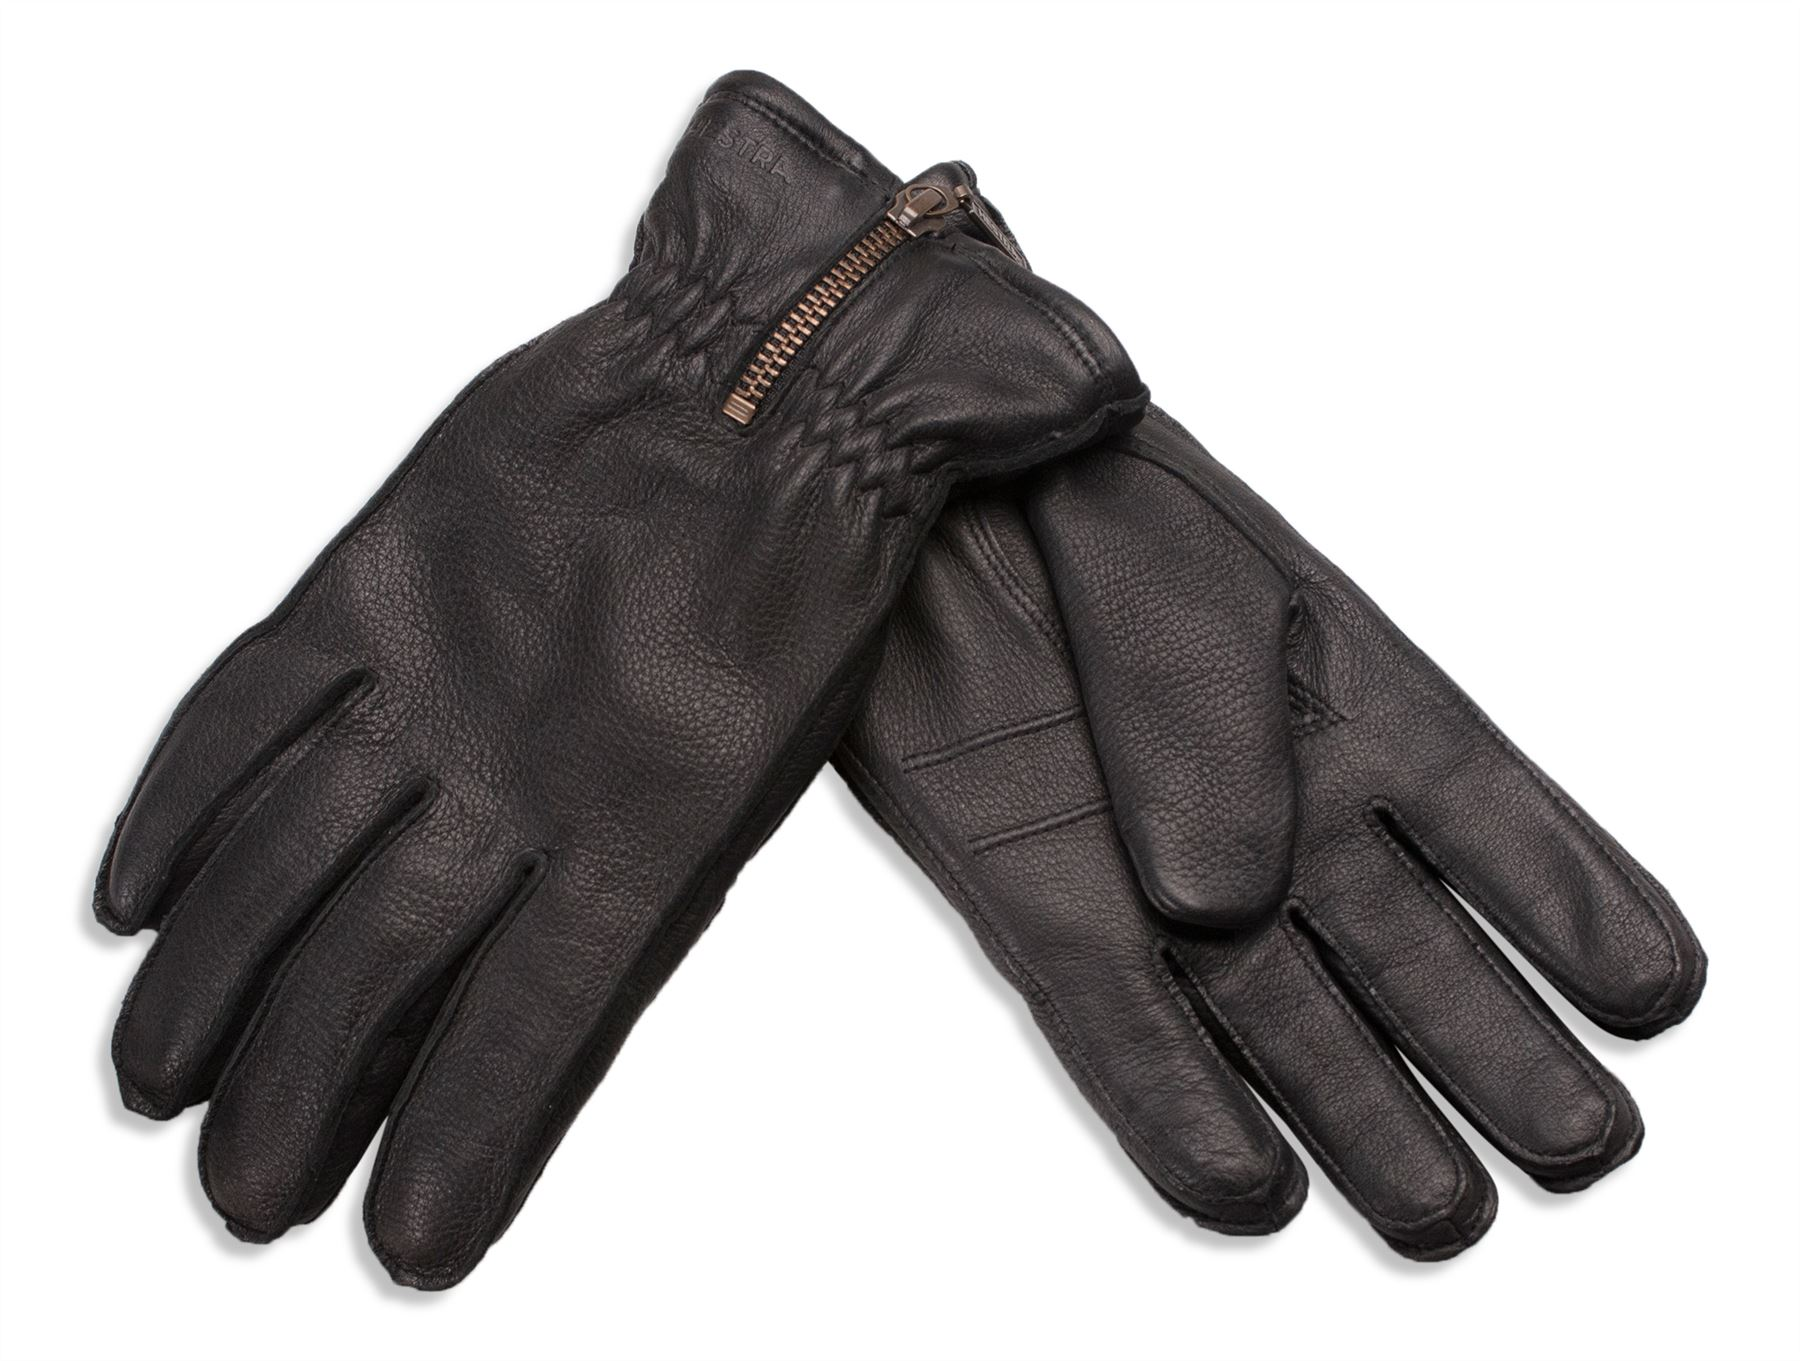 Ladies leather gloves wool lined - Hestra Mens Amp Womens Deer Skin Leather Gloves